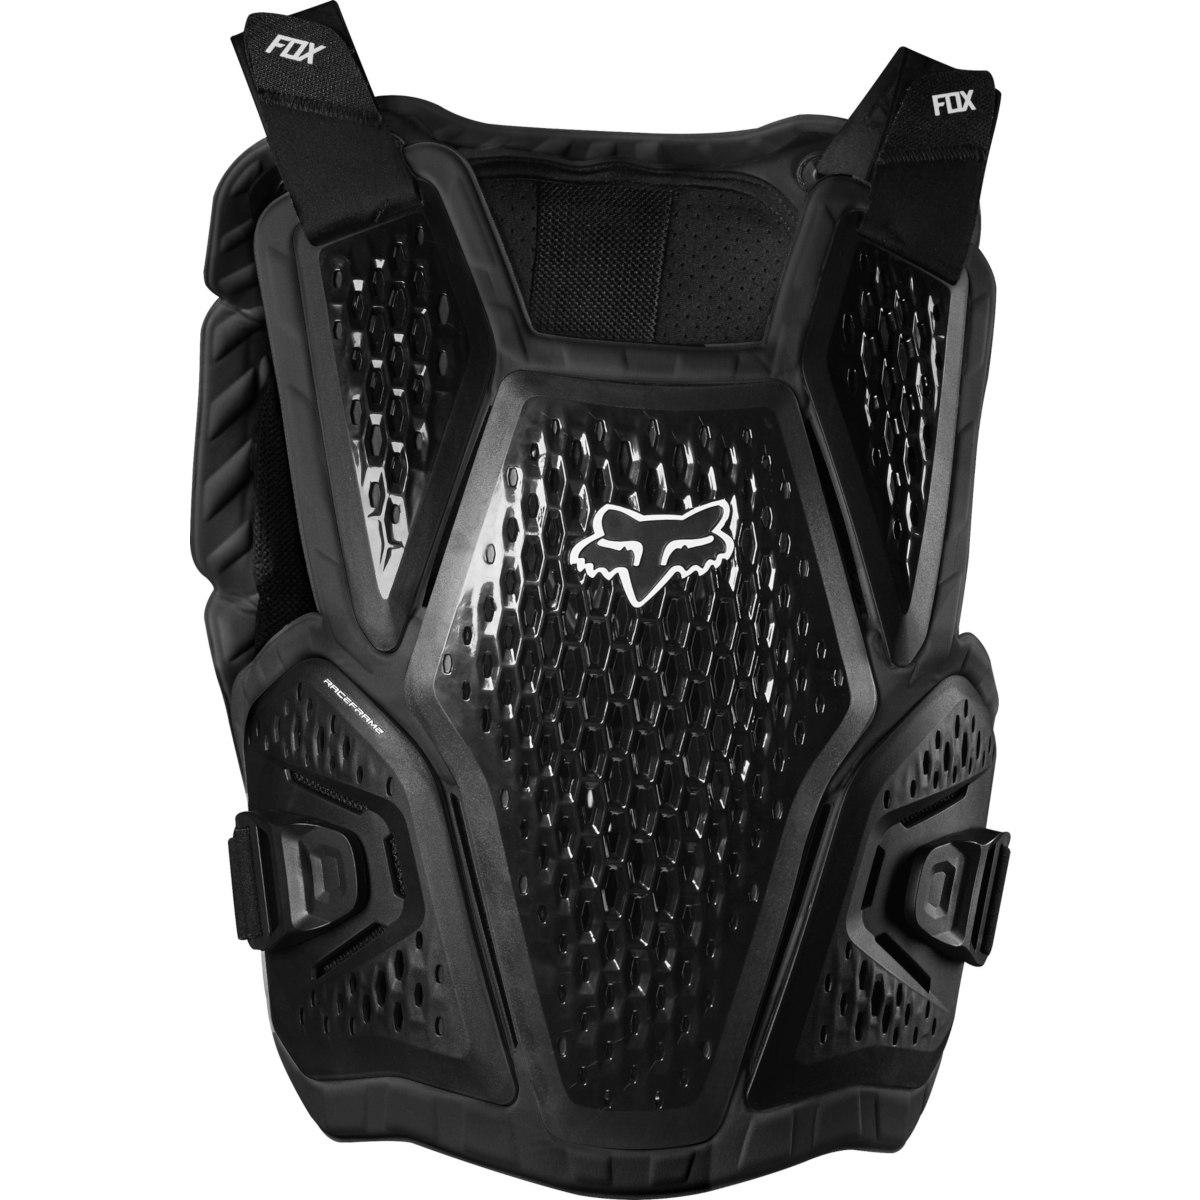 FOX Raceframe Impact CE Protector - black